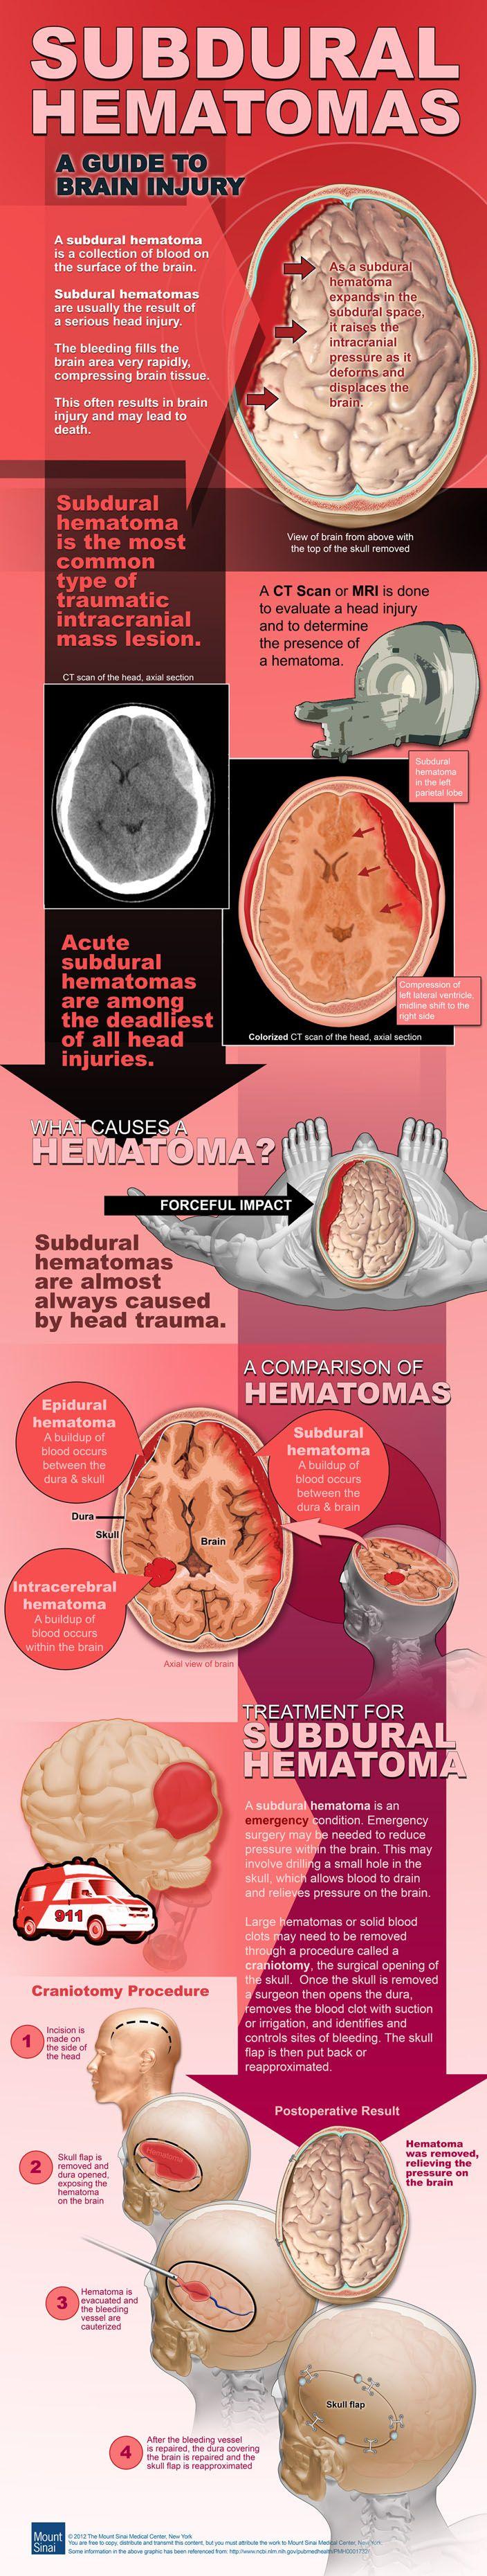 Subdural Hematoma - infographic (via Medicalopedia)